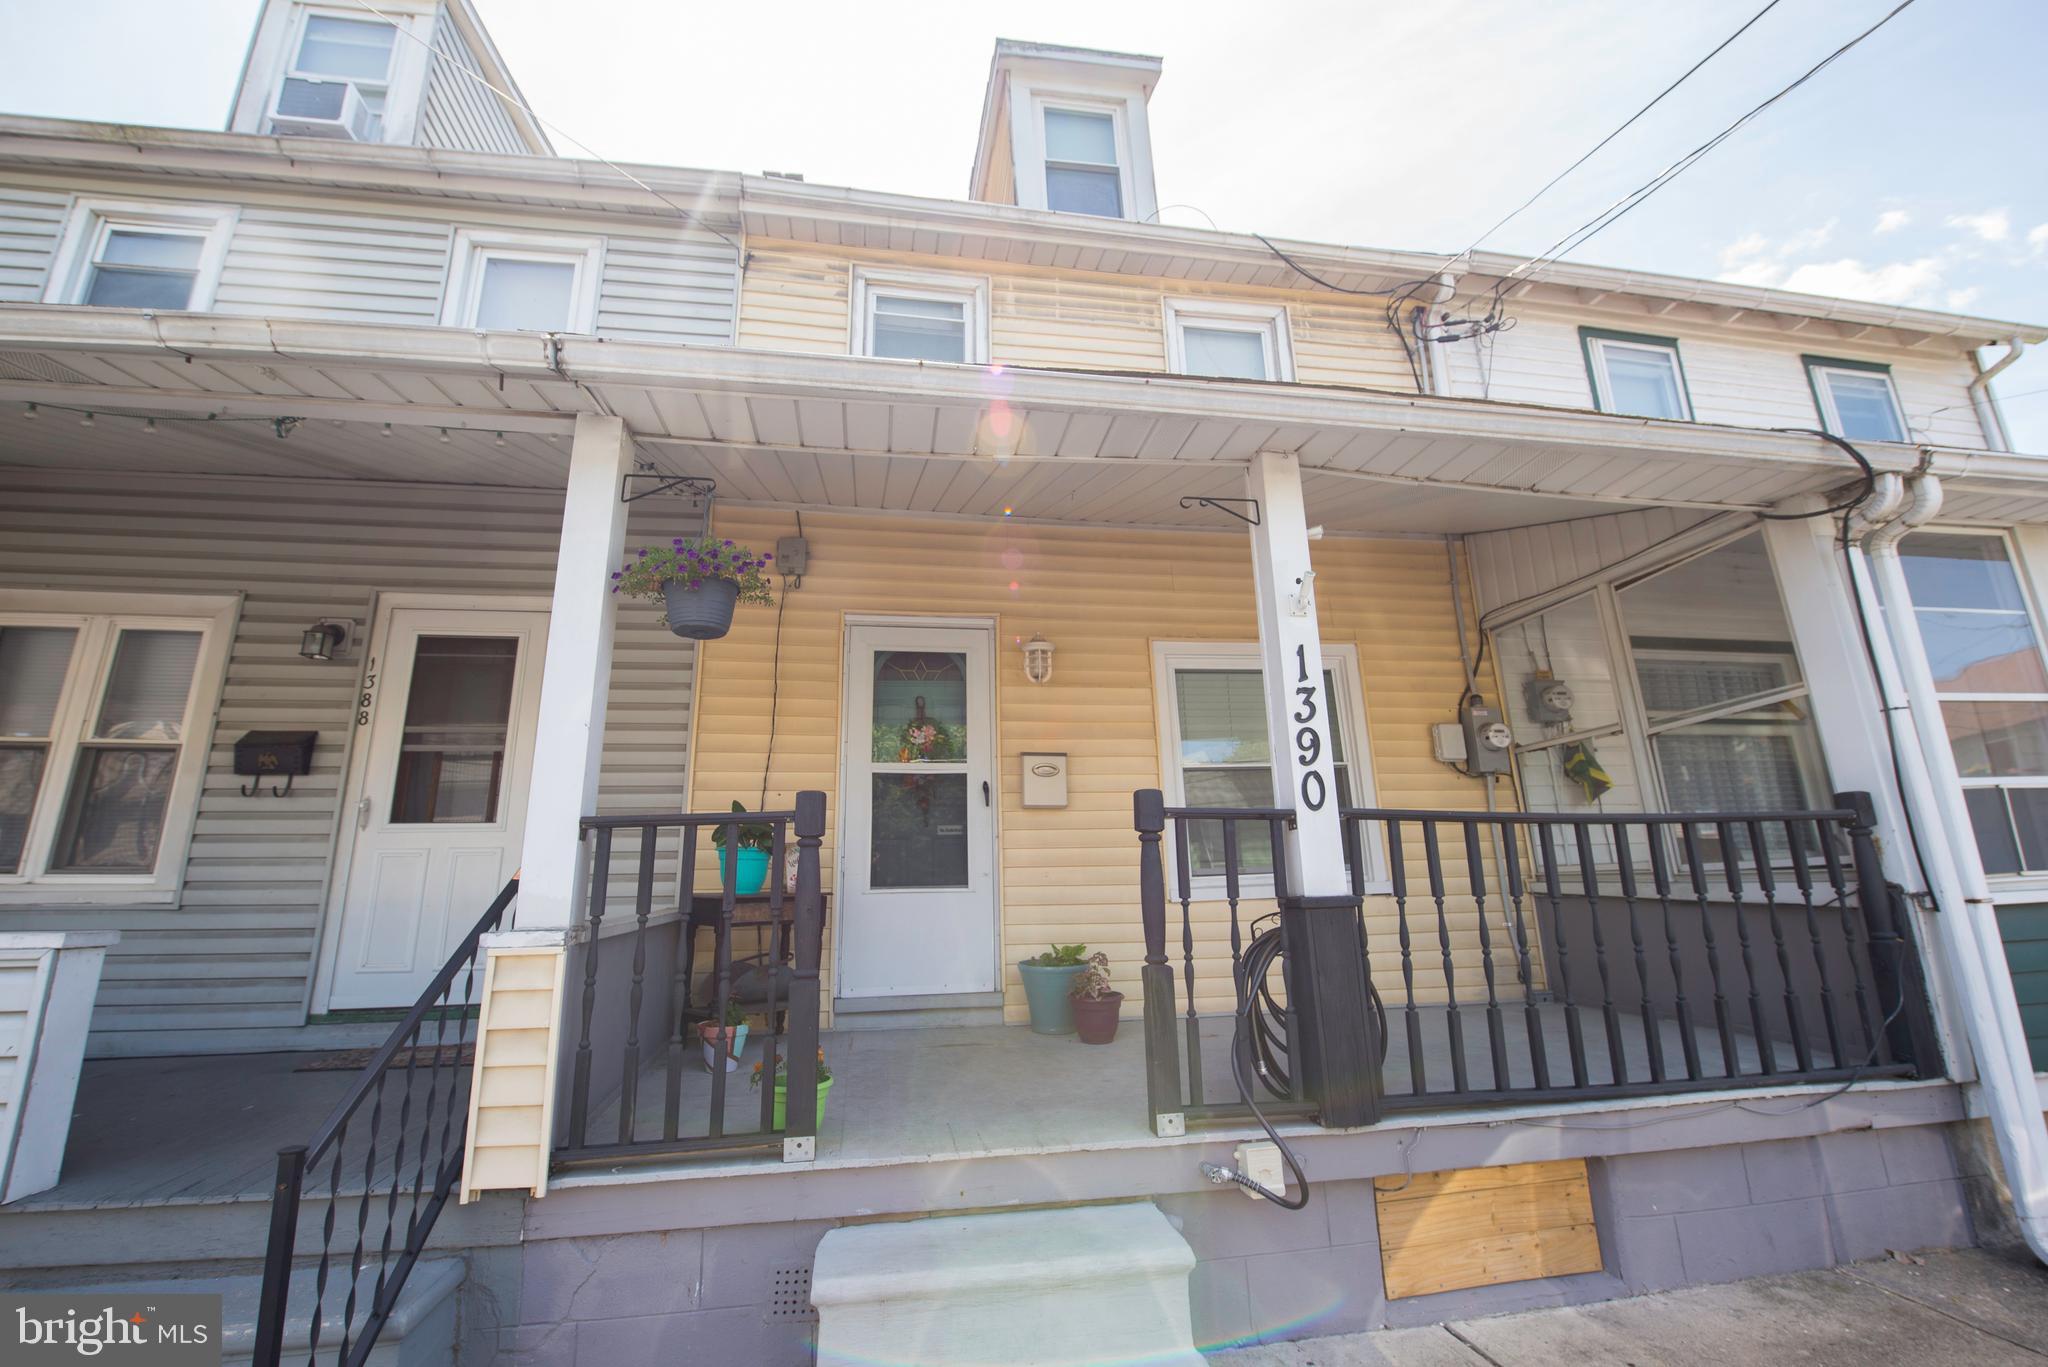 1390 STEWART STREET, NORTHAMPTON, PA 18067